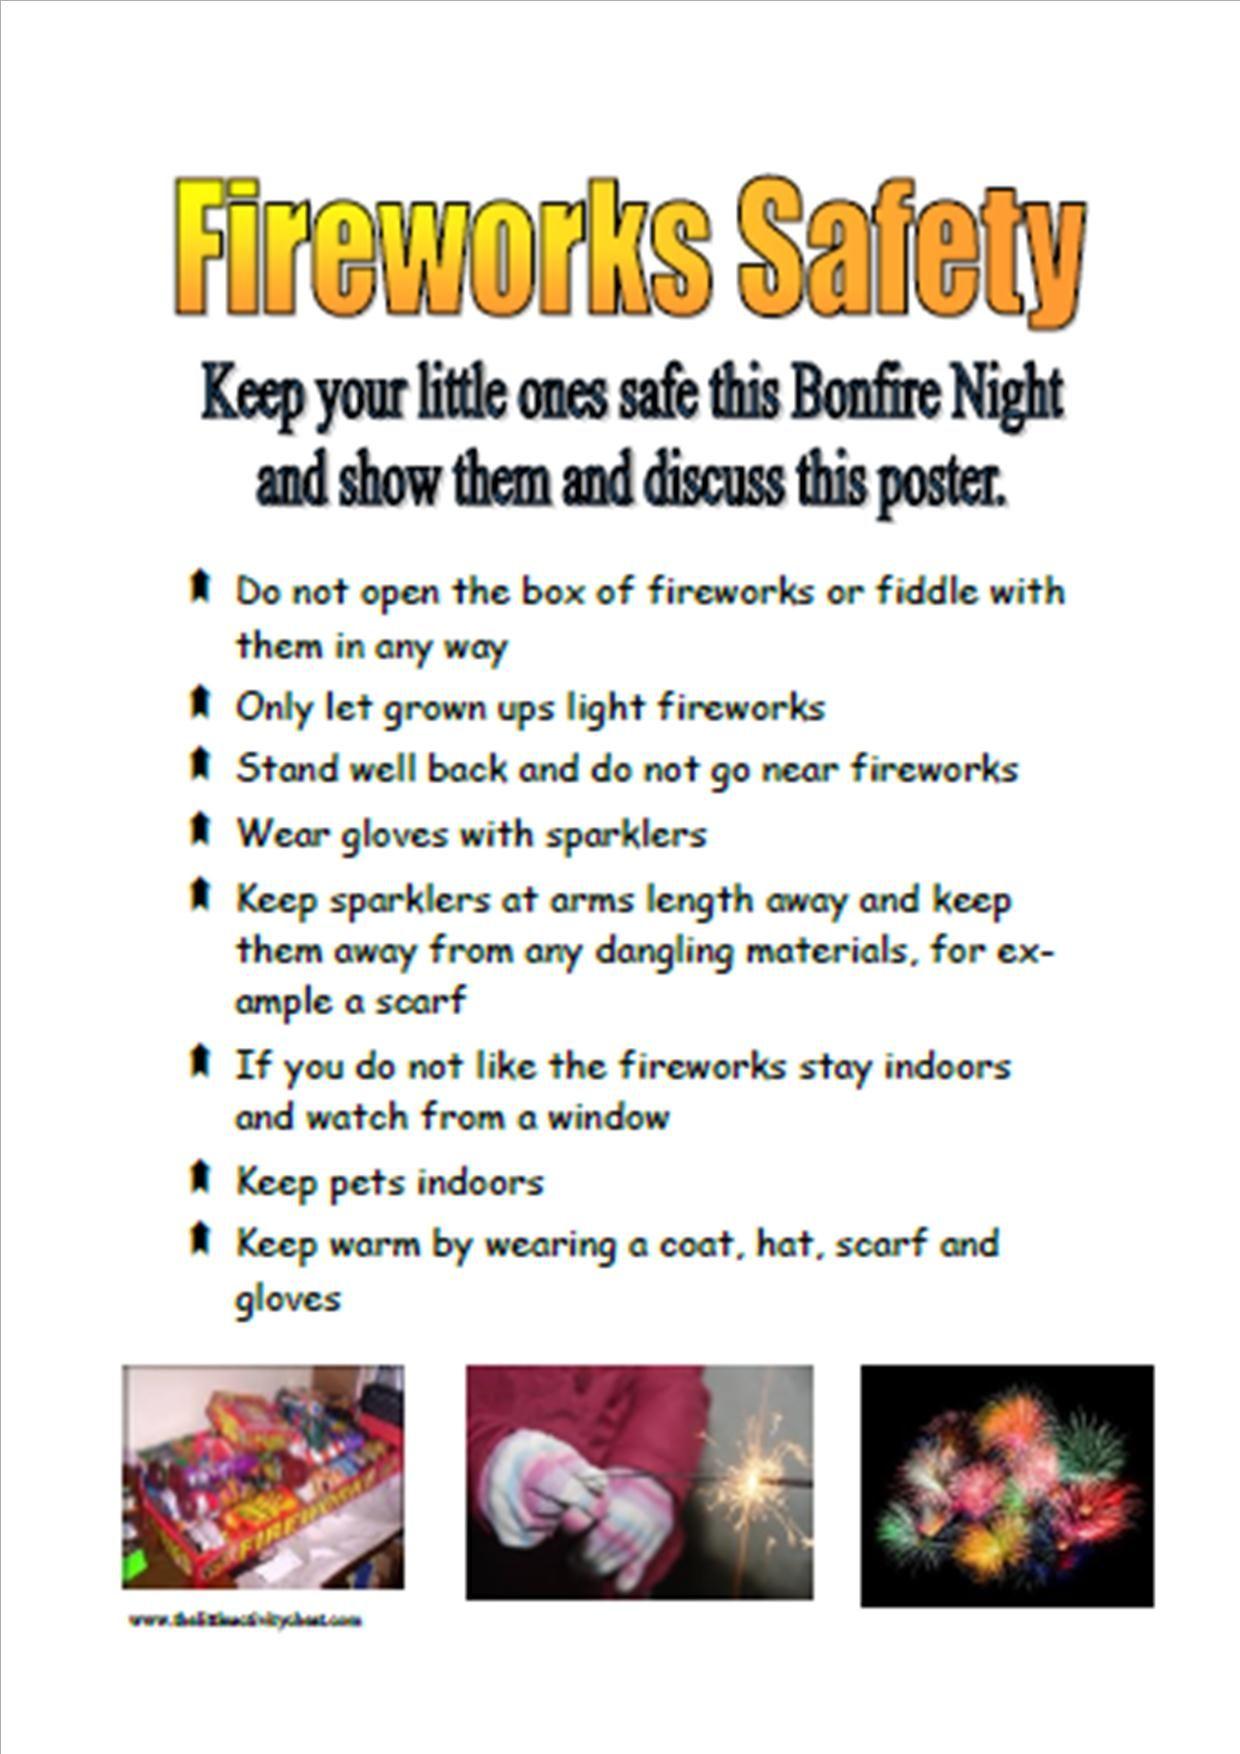 medium resolution of firework safety poster img